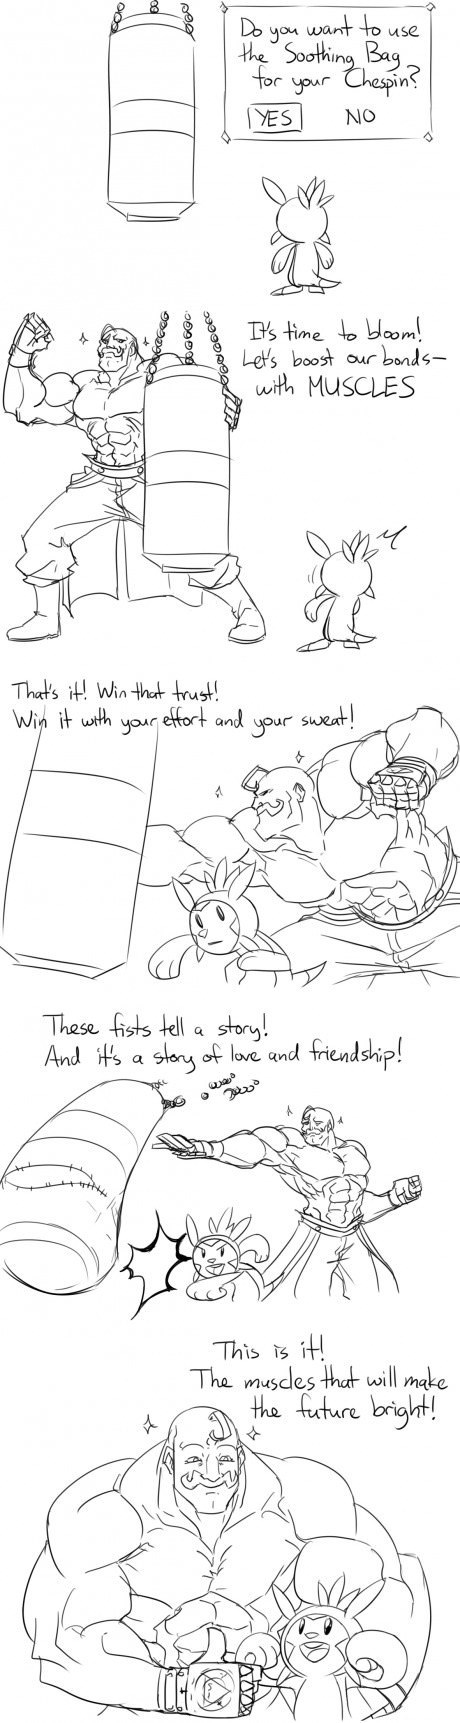 Pokémon chespin super training - 7888769280